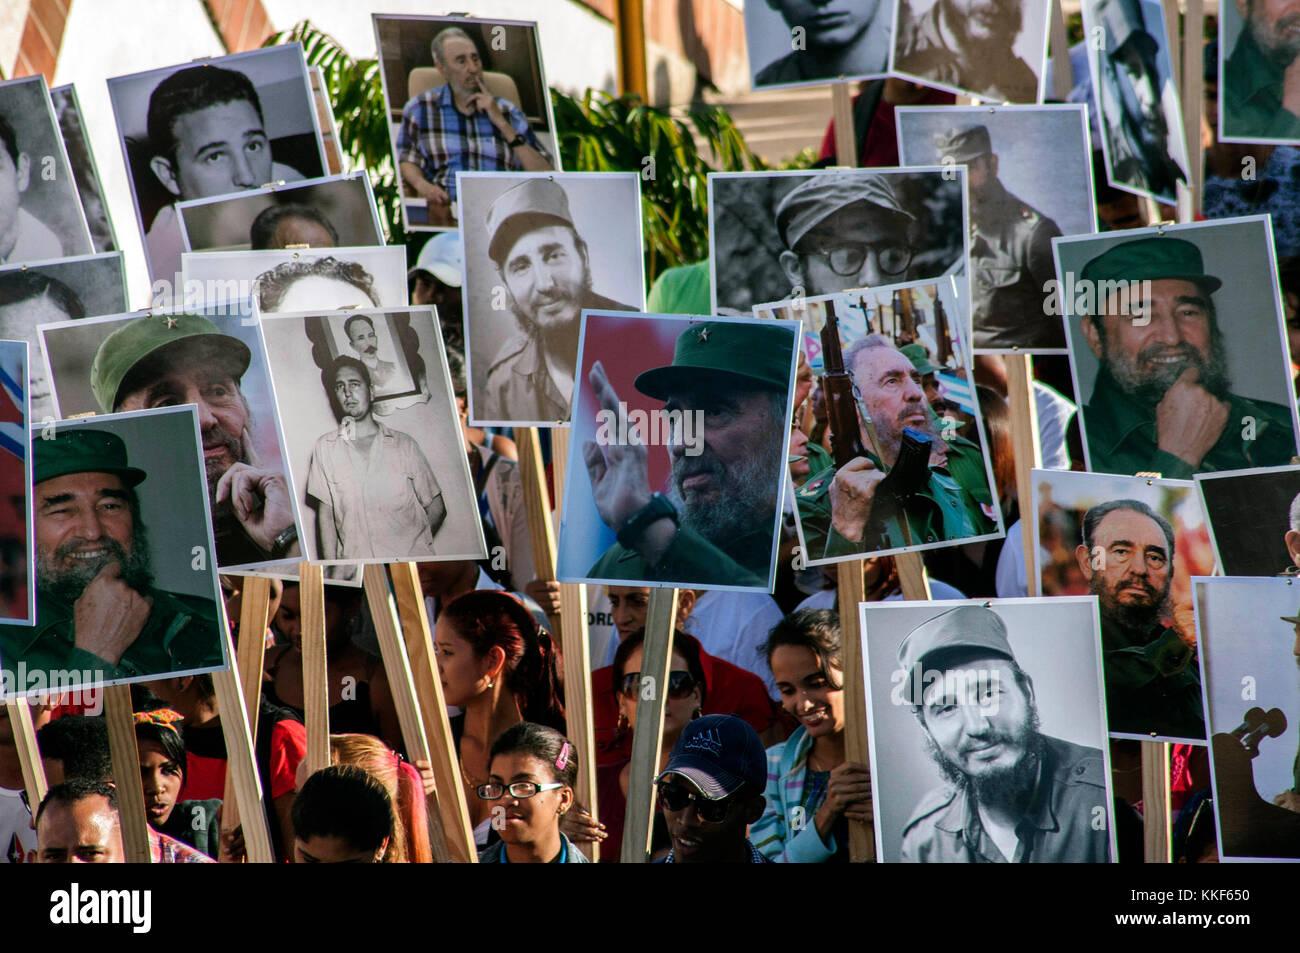 Santiago De Cuba, Cuba. 4th Dec, 2017. People hold pictures of late Cuban President Fidel Castro during a pilgrimage - Stock Image